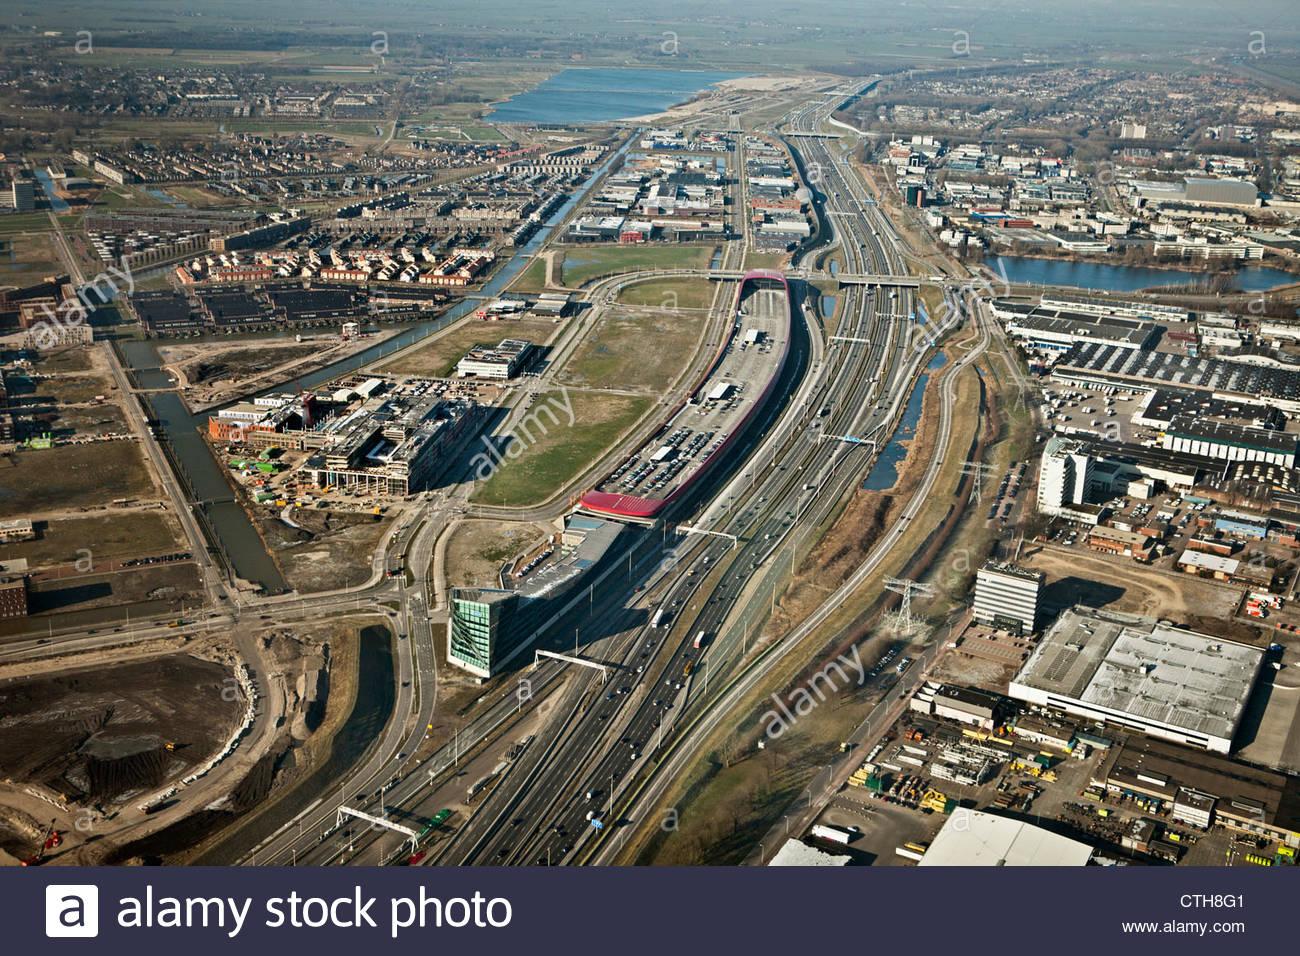 The Netherlands, Utrecht, A2 highway. aerial. - Stock Image